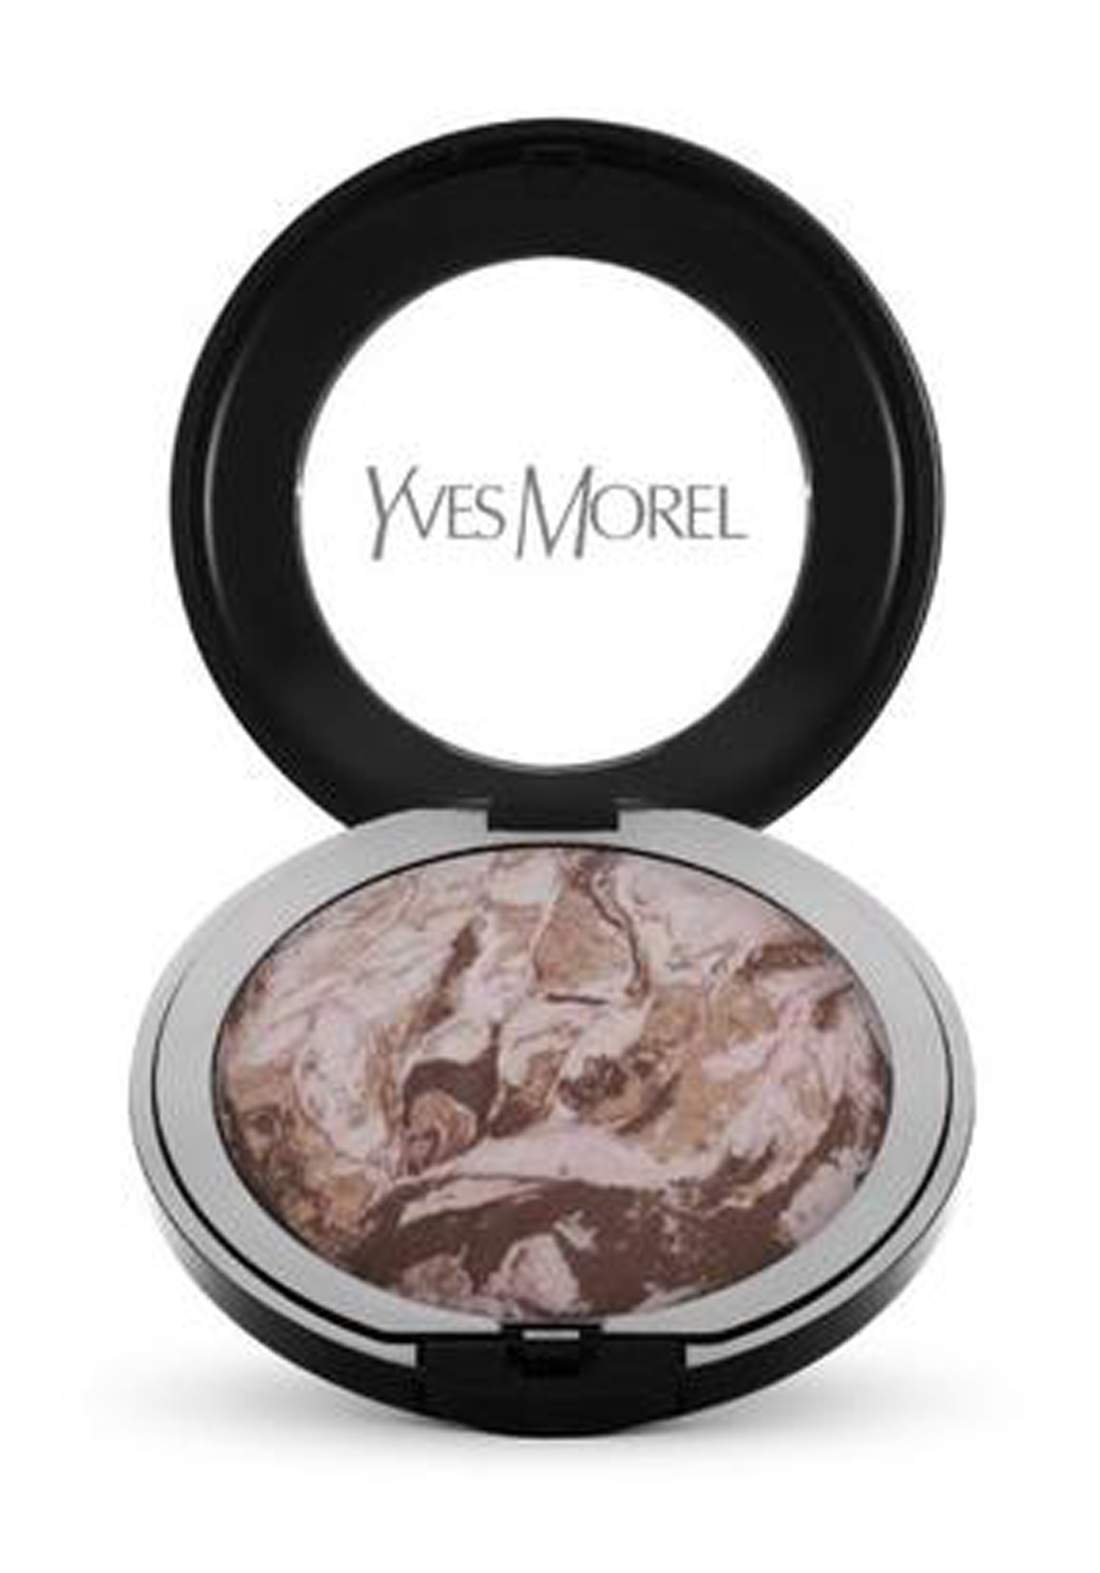 Yves Morel Baked Blusher N0.20 احمر خدود